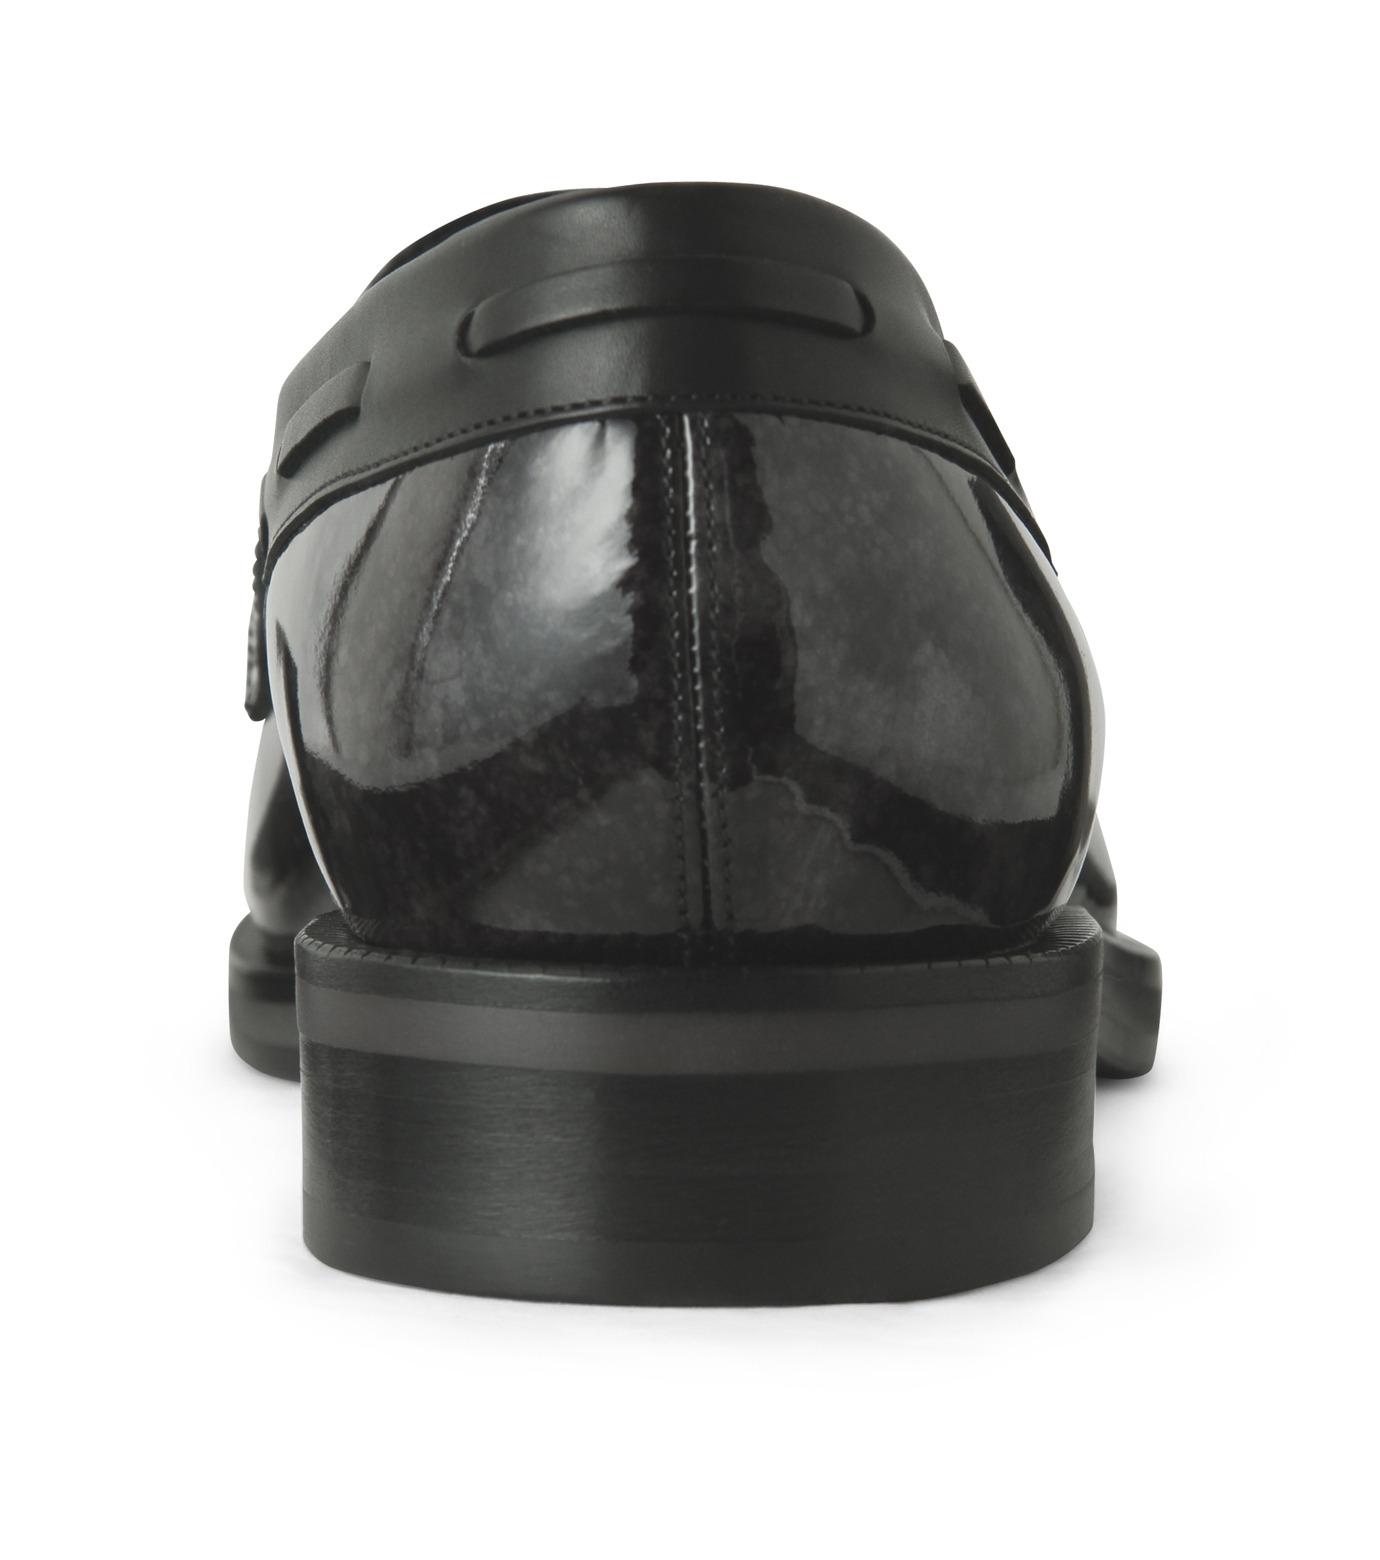 Jimmy Choo(ジミーチュウ)のMarble Patent-BLACK(シューズ/shoes)-NATHAN-MBP-13 拡大詳細画像2